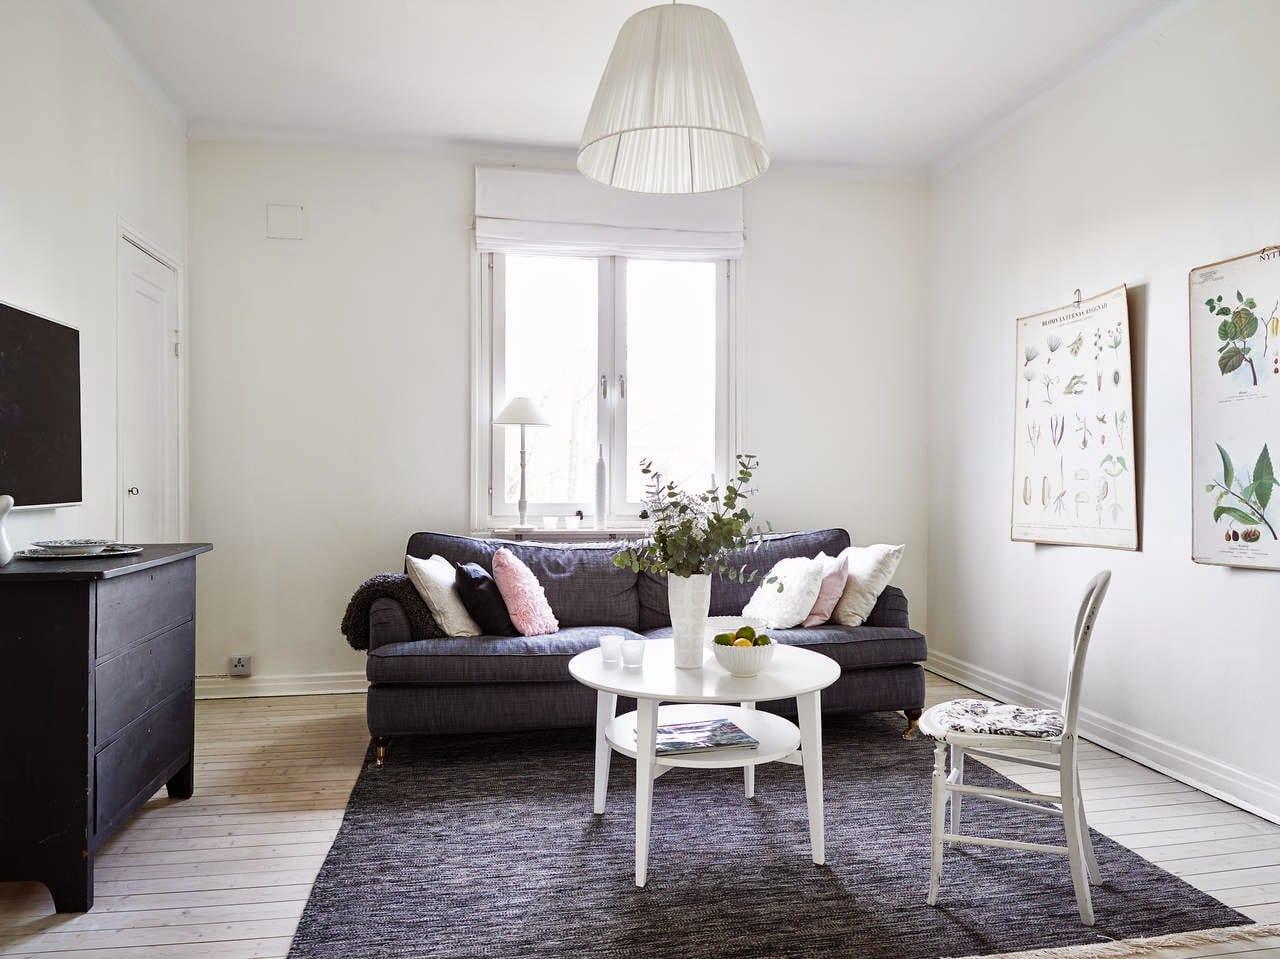 Consejos para decorar un piso de soltera for Decorar in piso